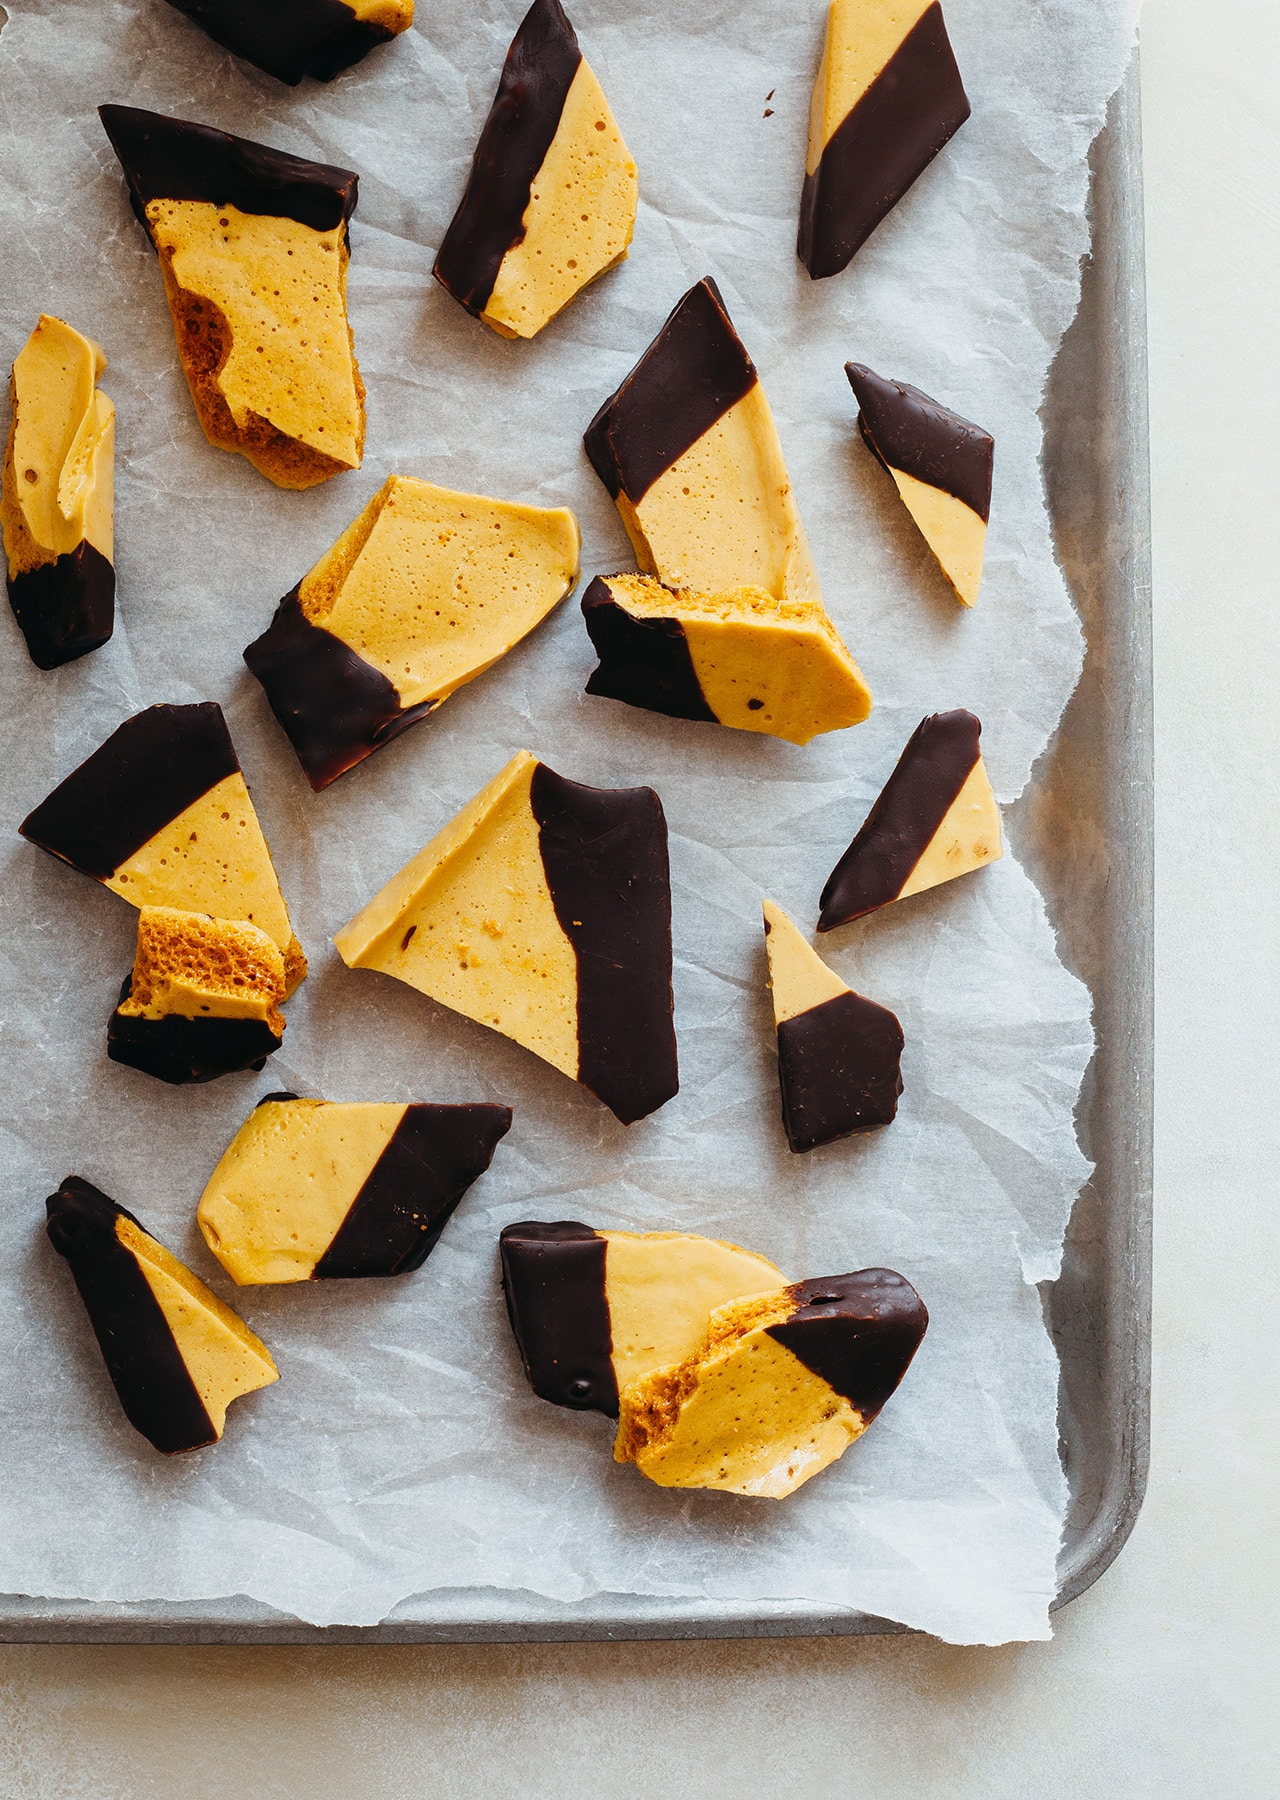 How to make vegan honeycomb recipe